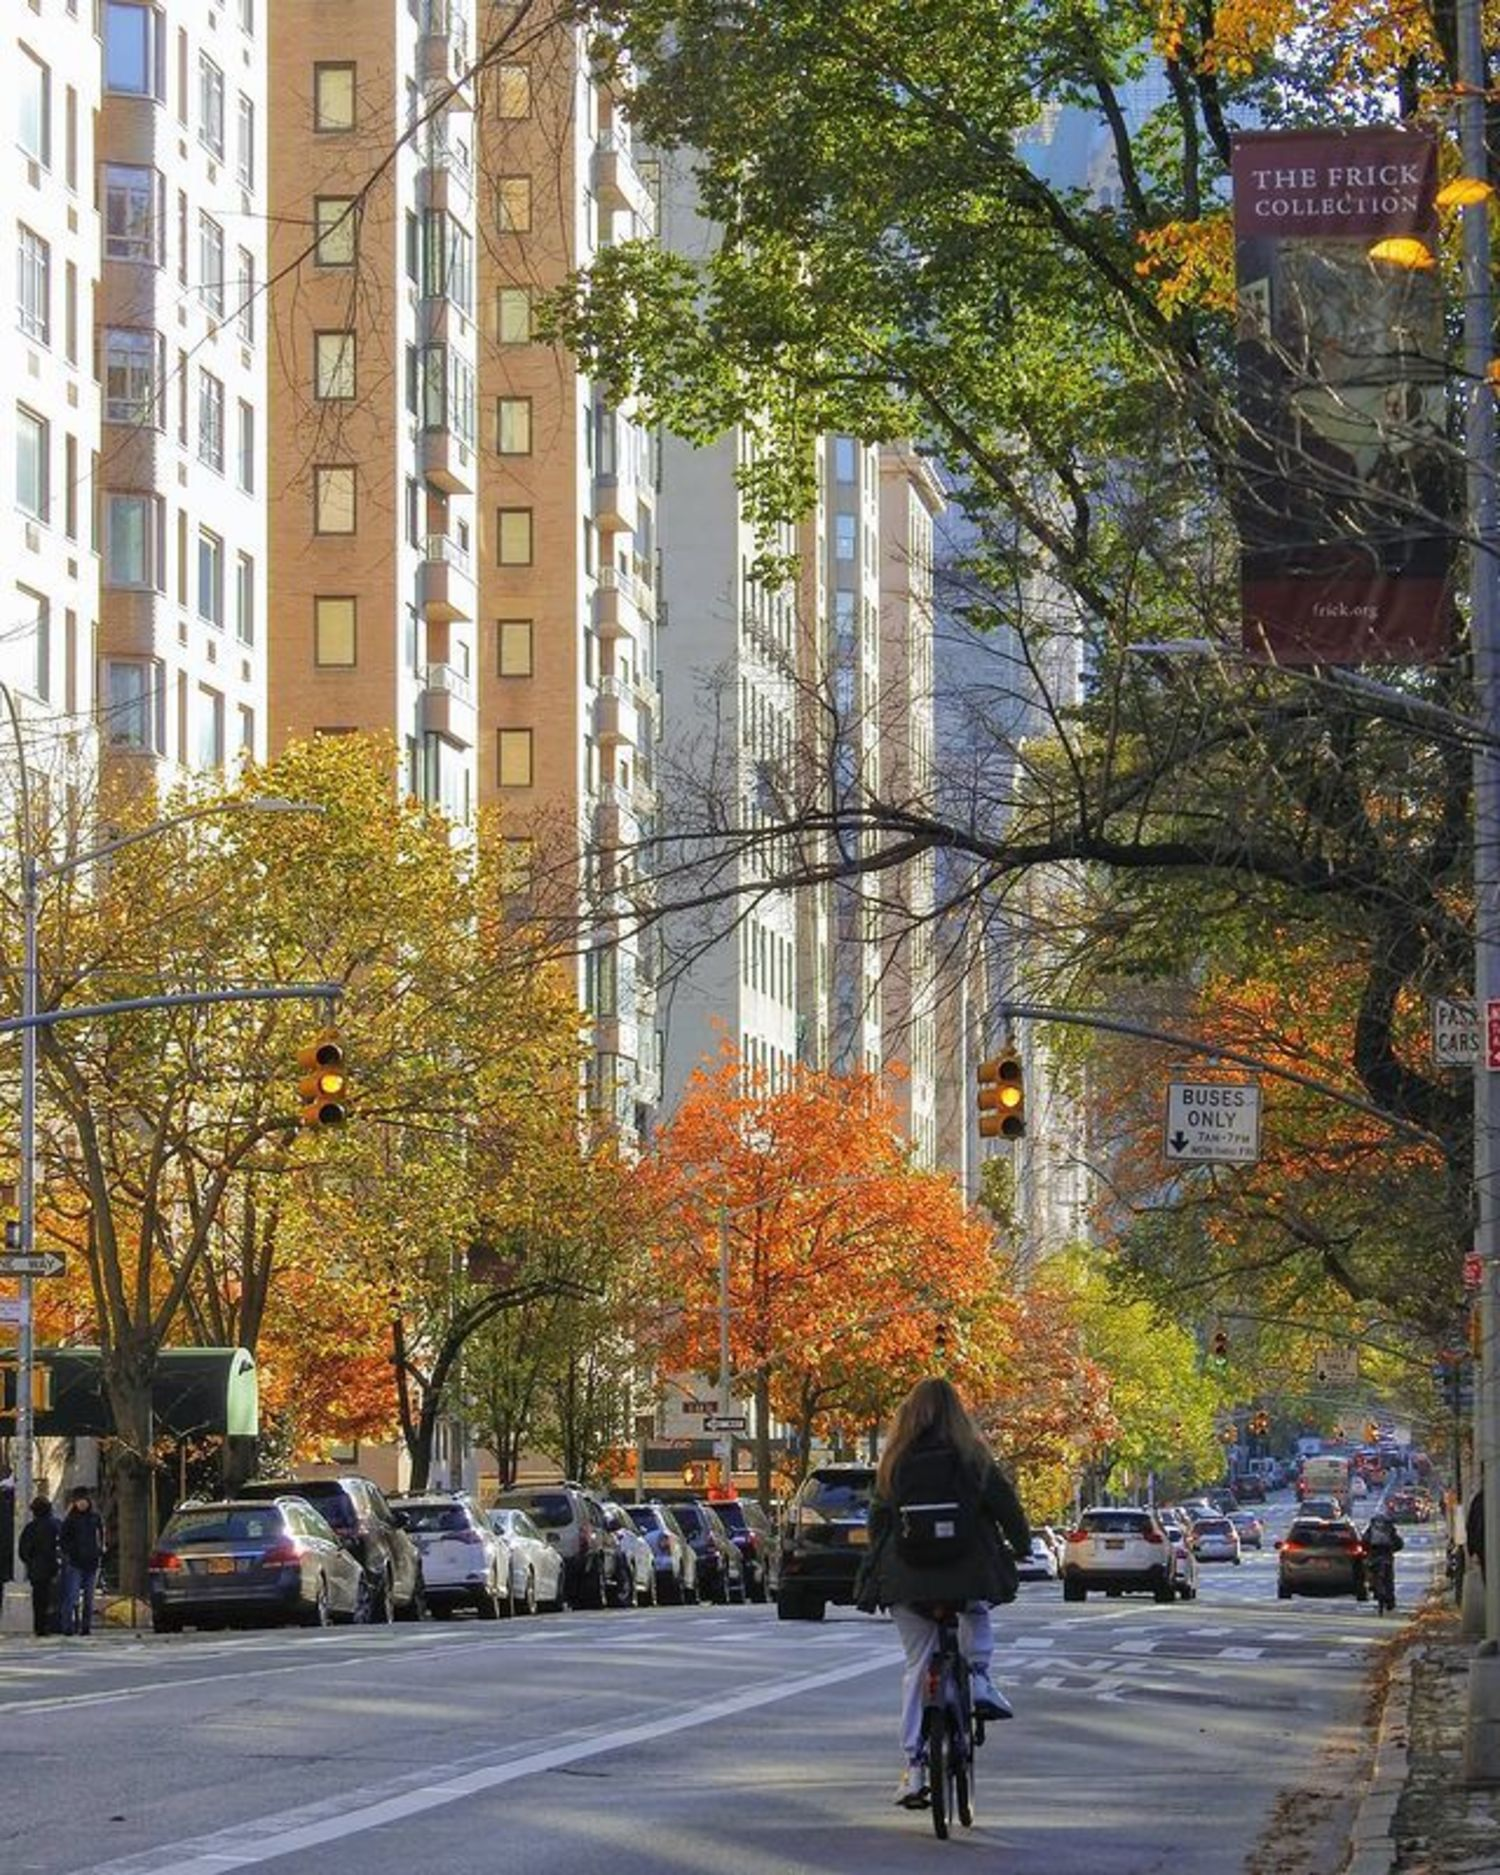 5th Avenue, Upper East Side, Manhattan